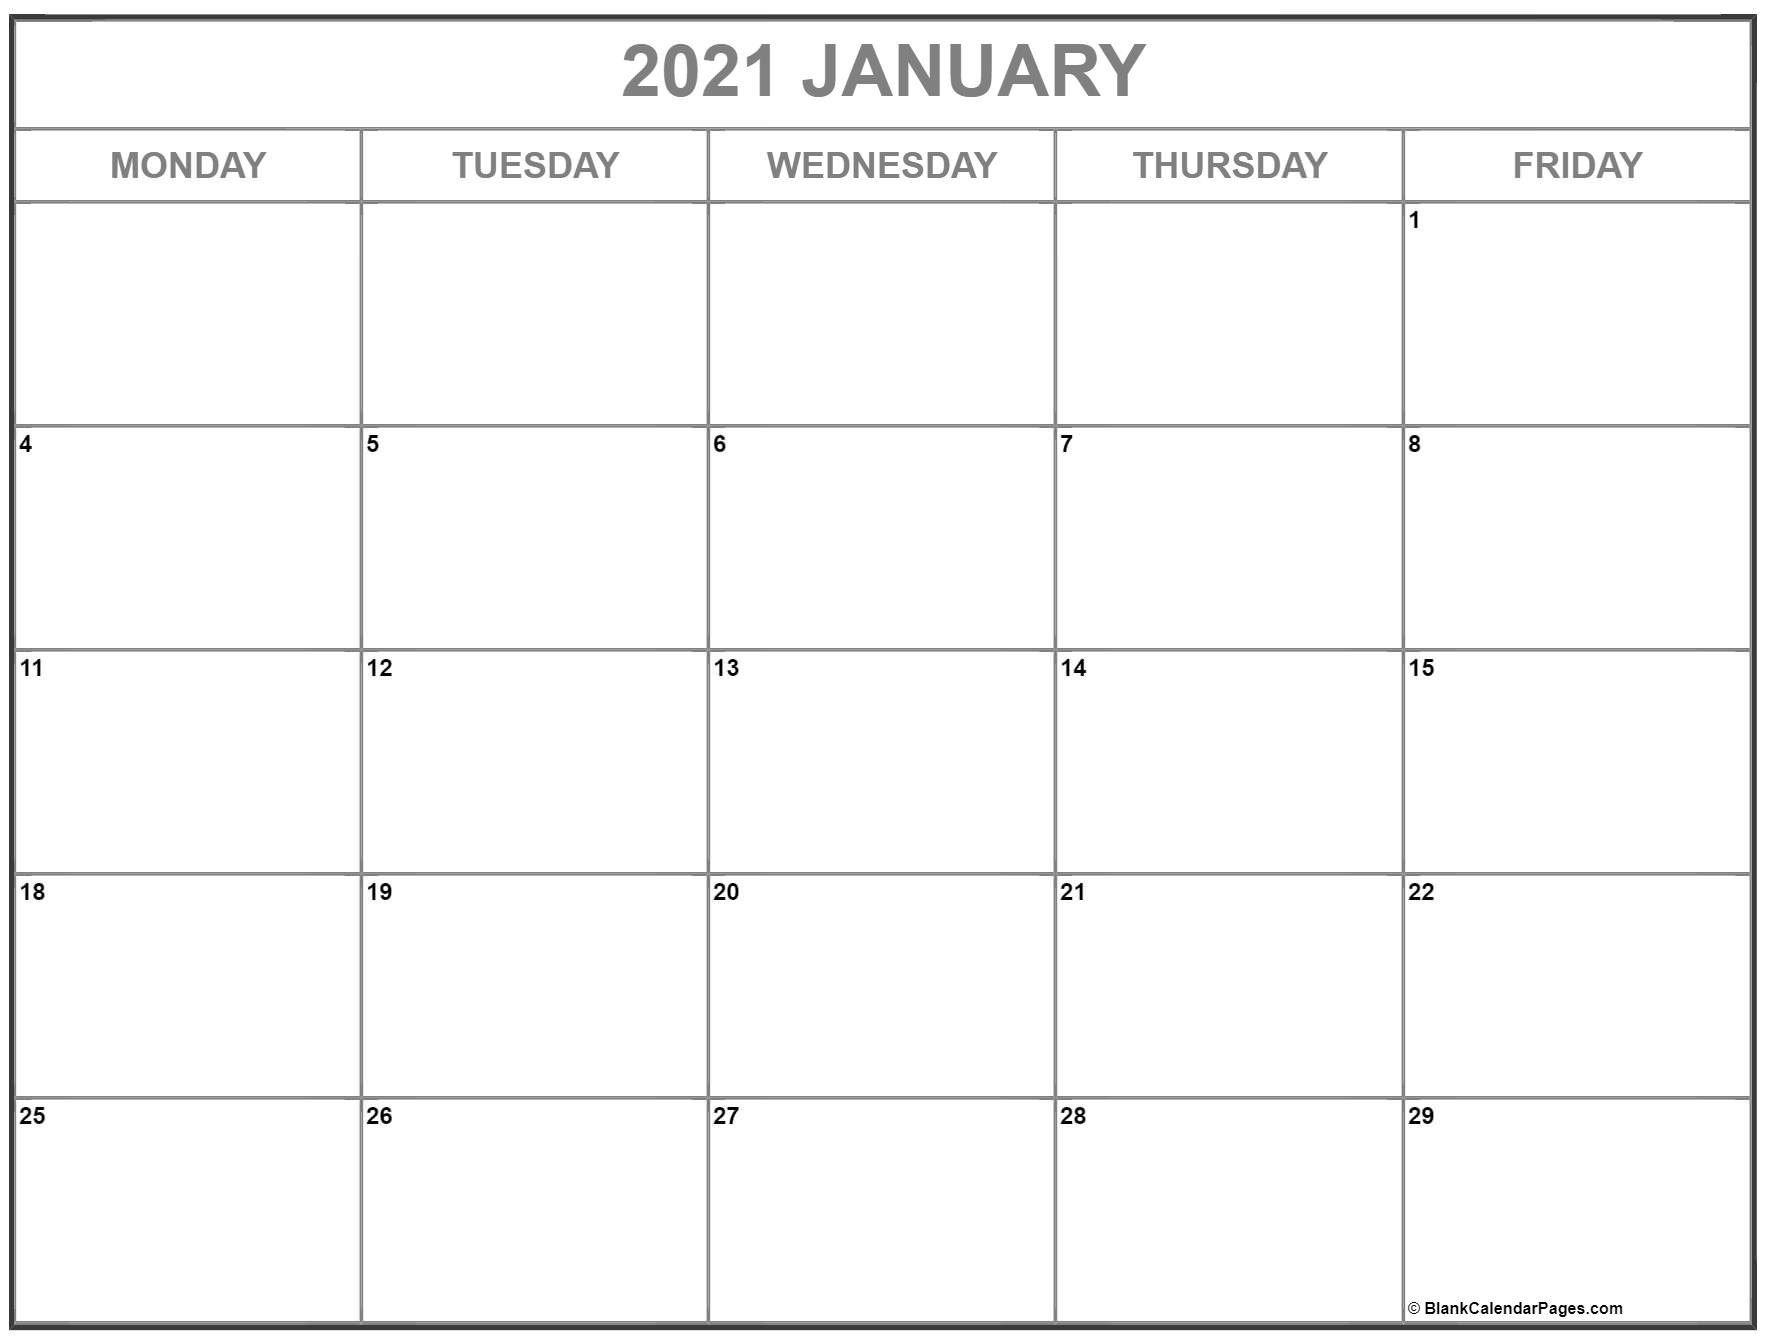 January 2021 Calendar Monday to Friday | Calendar ...